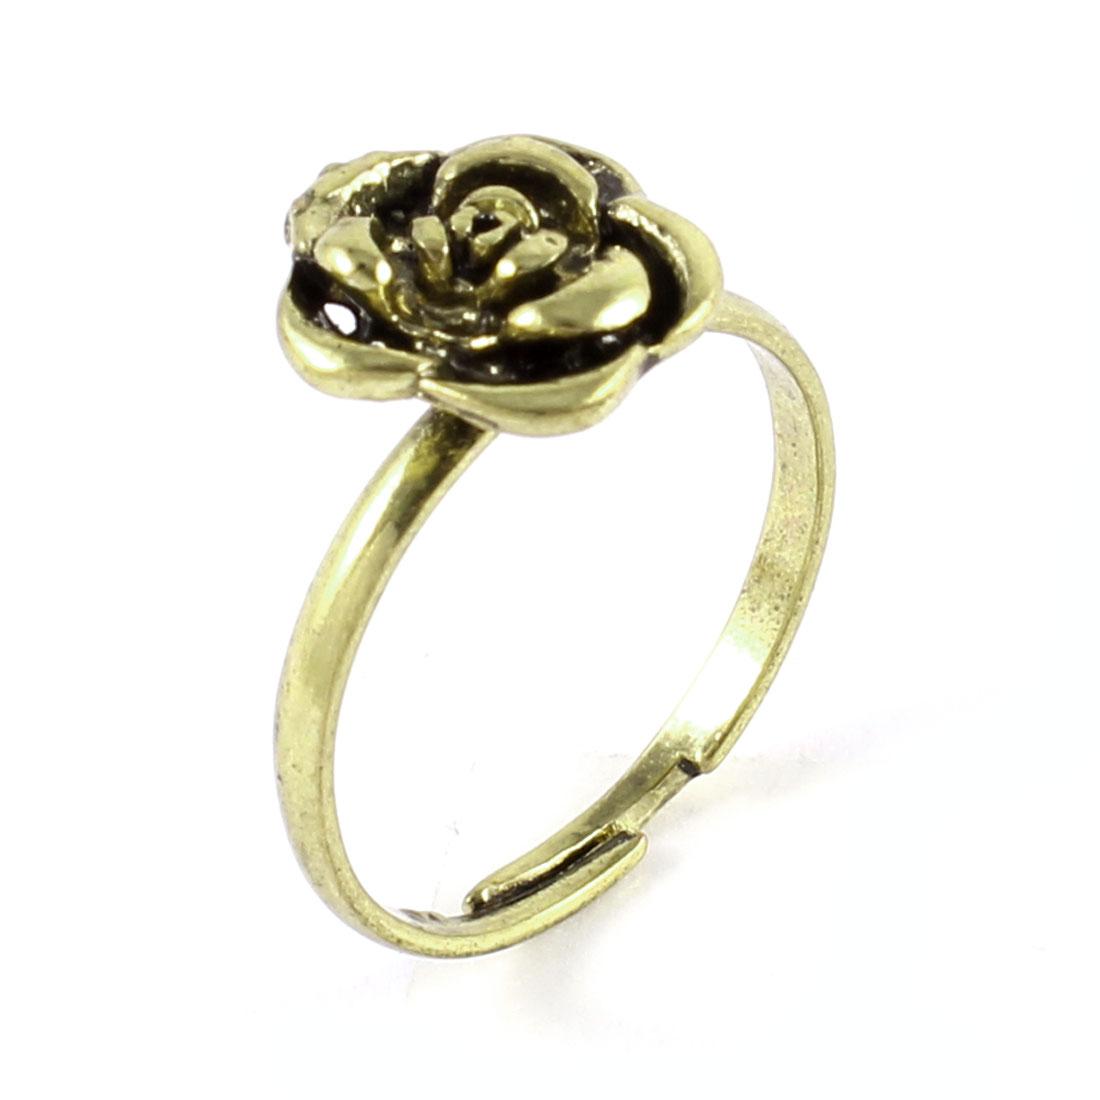 Ladies Bronze Tone Metal Rose Flower Detailing Adjustable Finger Ring Gift